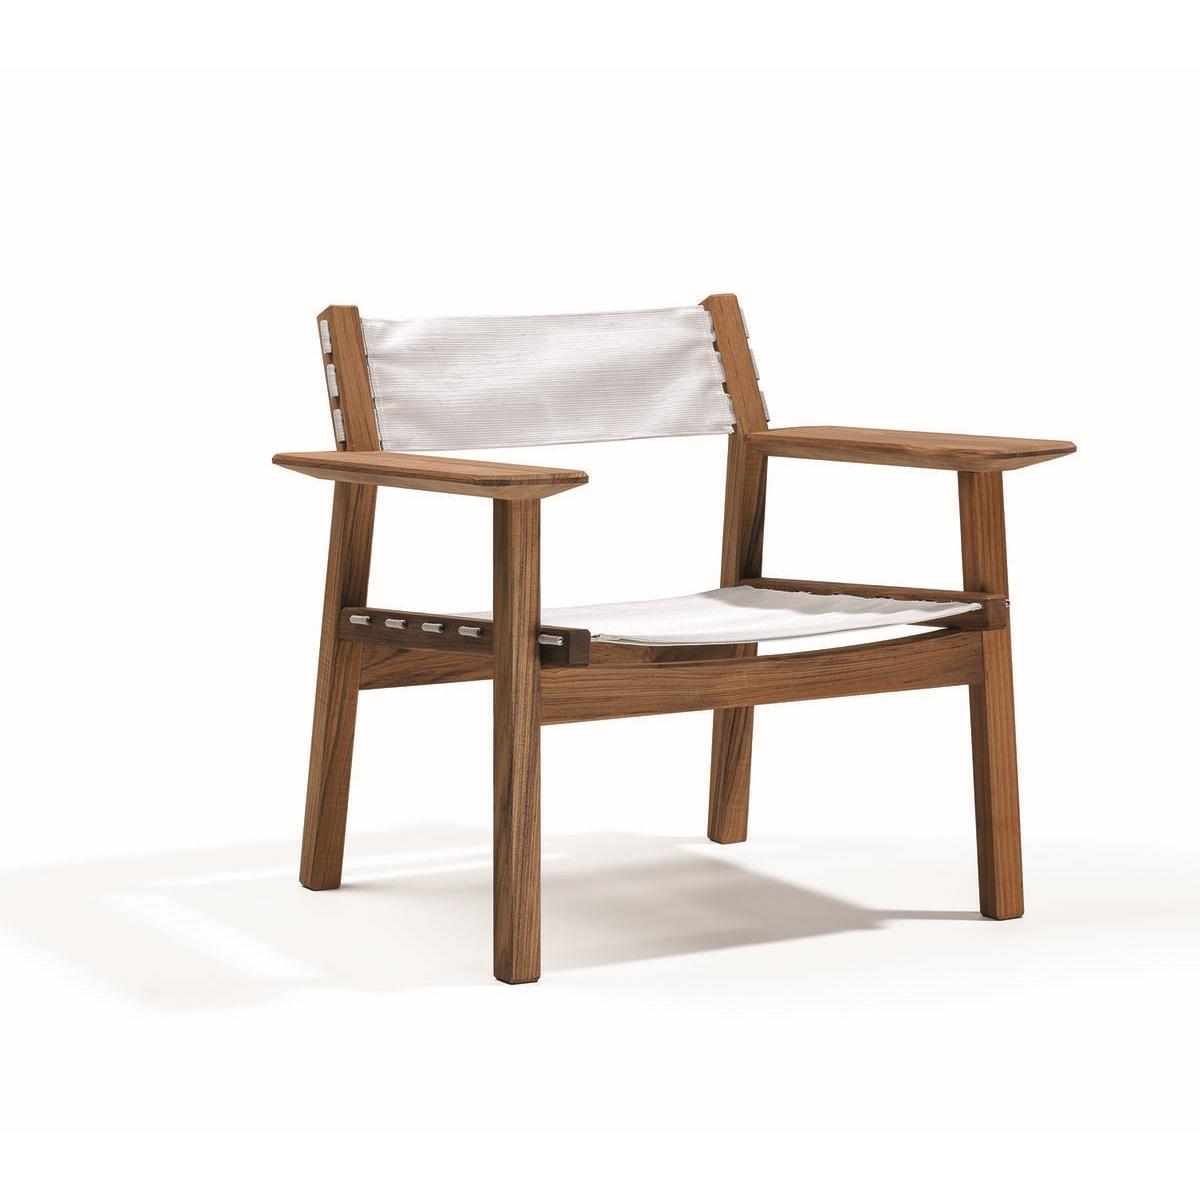 Djurö Lounge chair teak / textil, Skargaarden